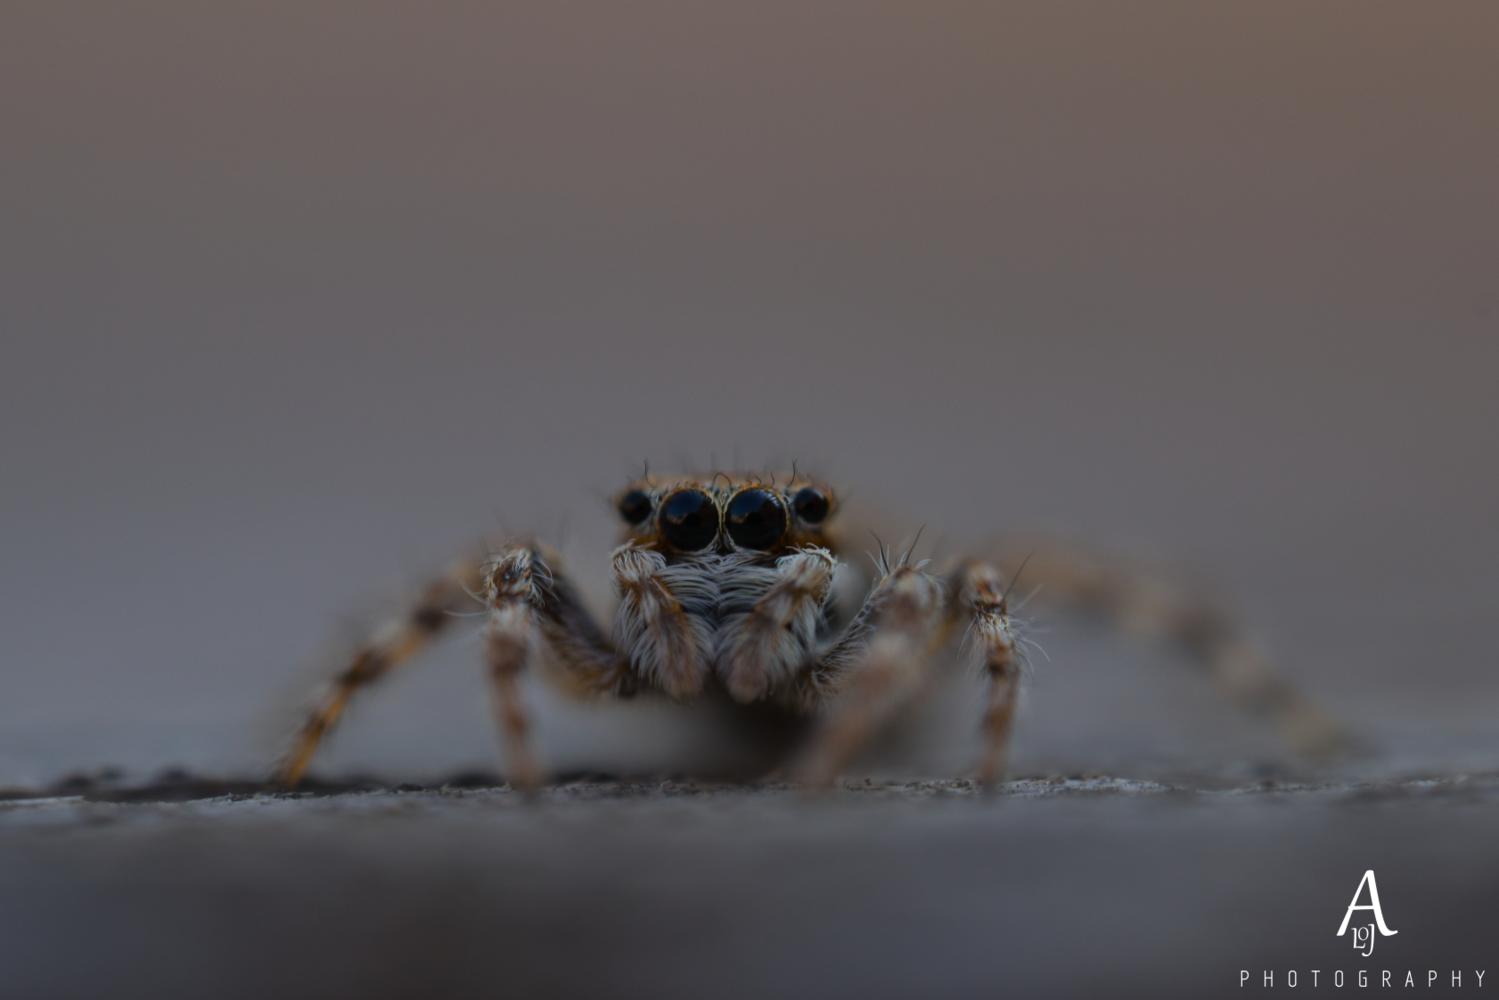 The spider looks at the camera. by Aljo Antony